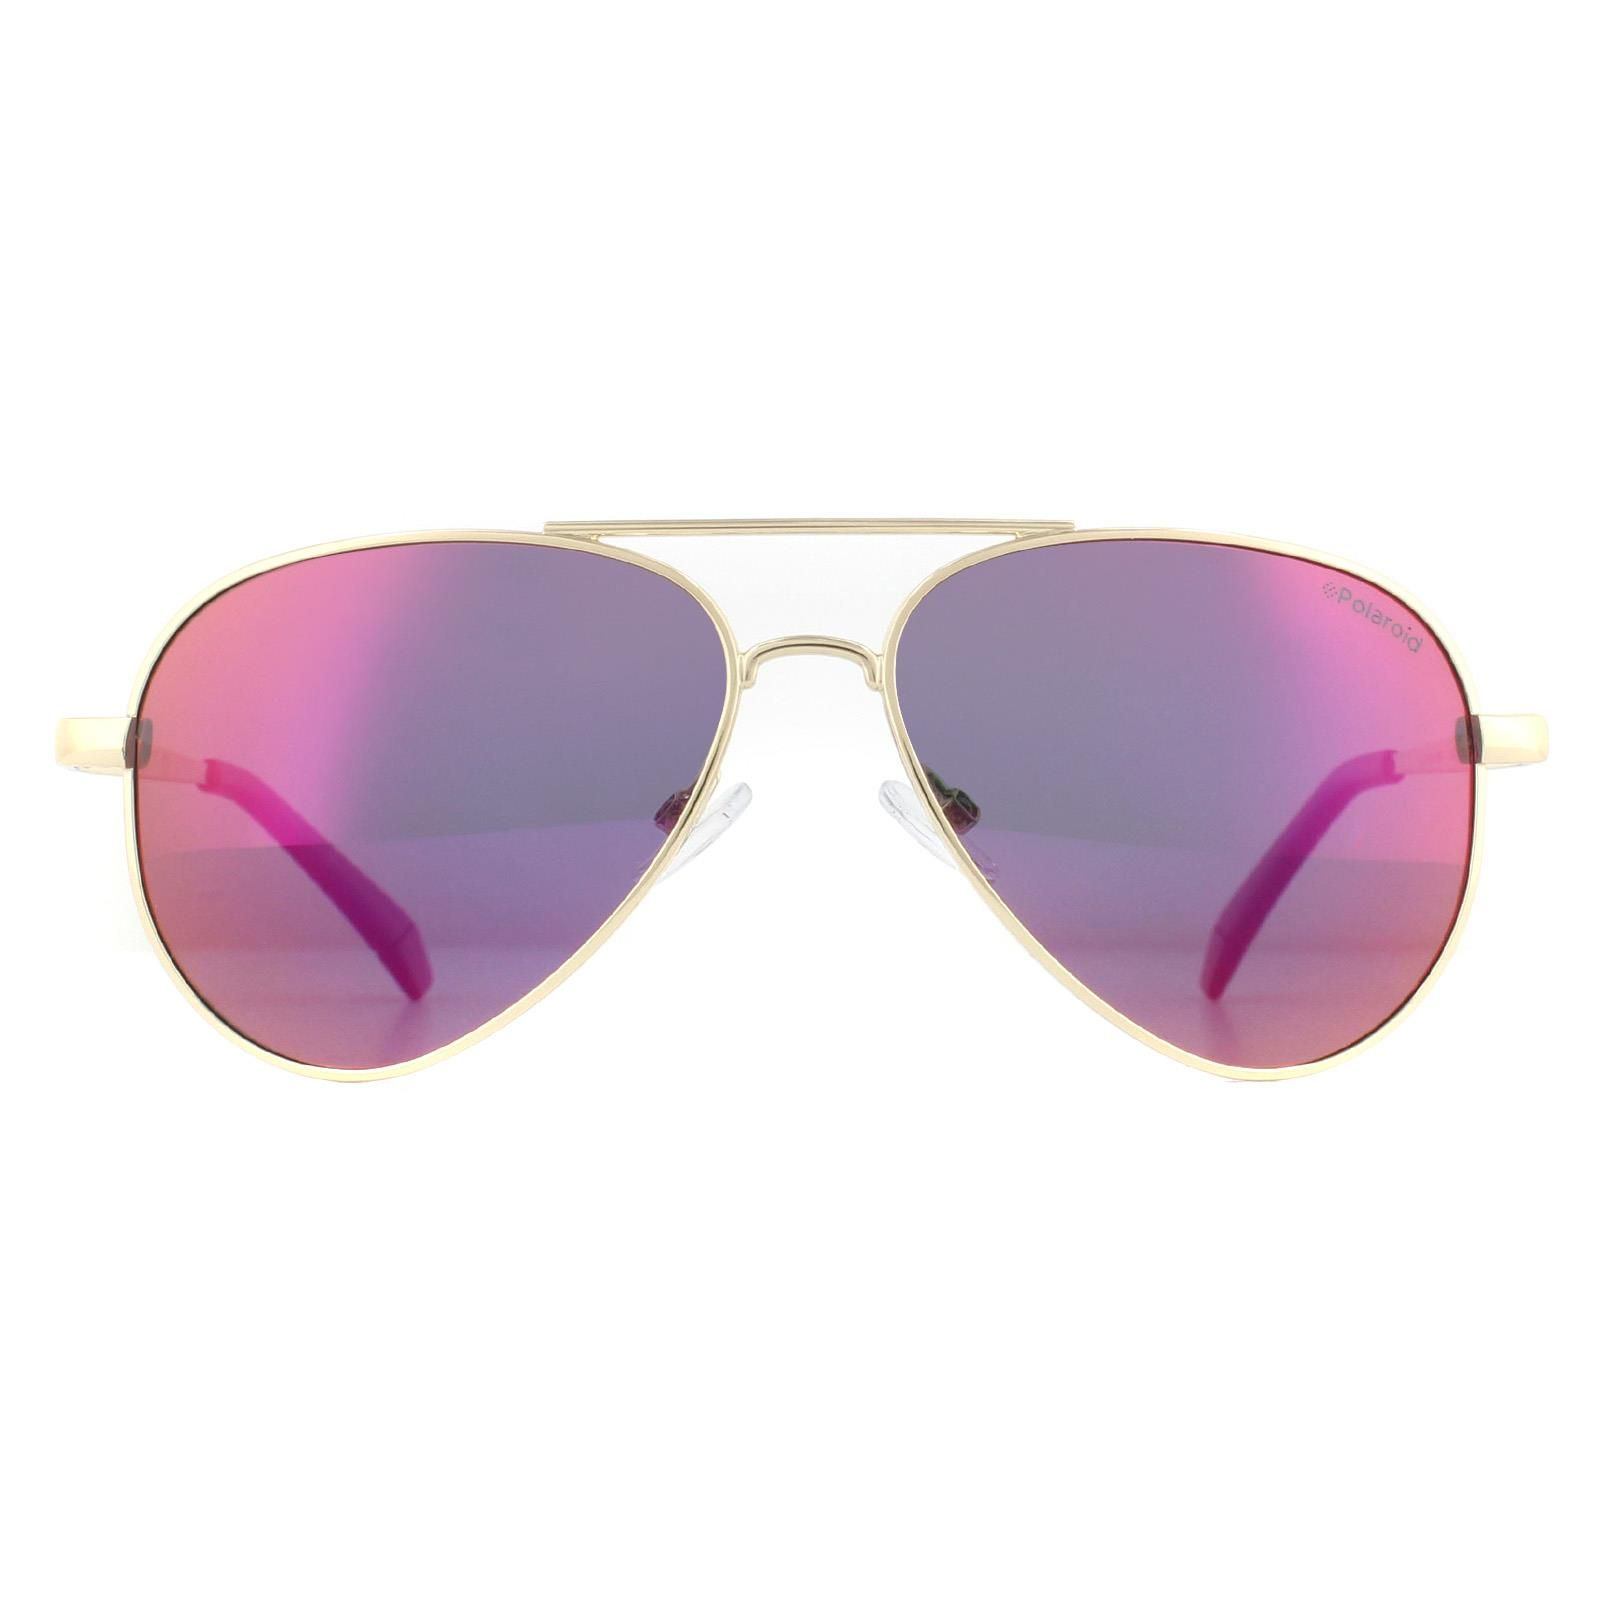 Polaroid Sunglasses 6012/N/NEW J5G Aviator LA Gold Brown Gradient Polarized